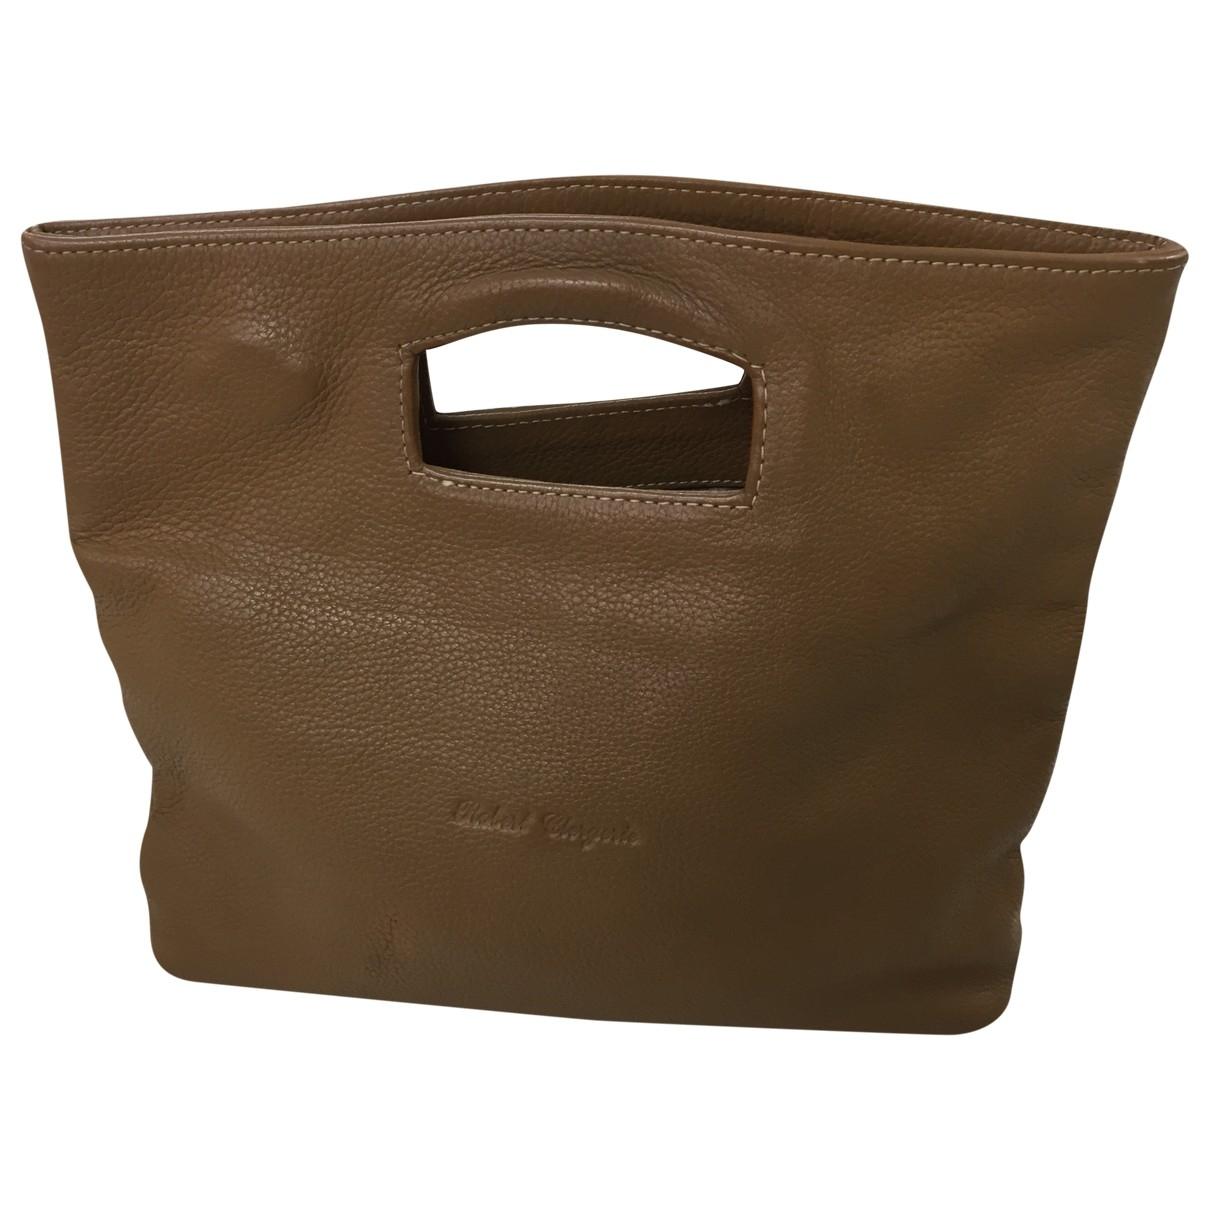 Robert Clergerie \N Camel Leather handbag for Women \N